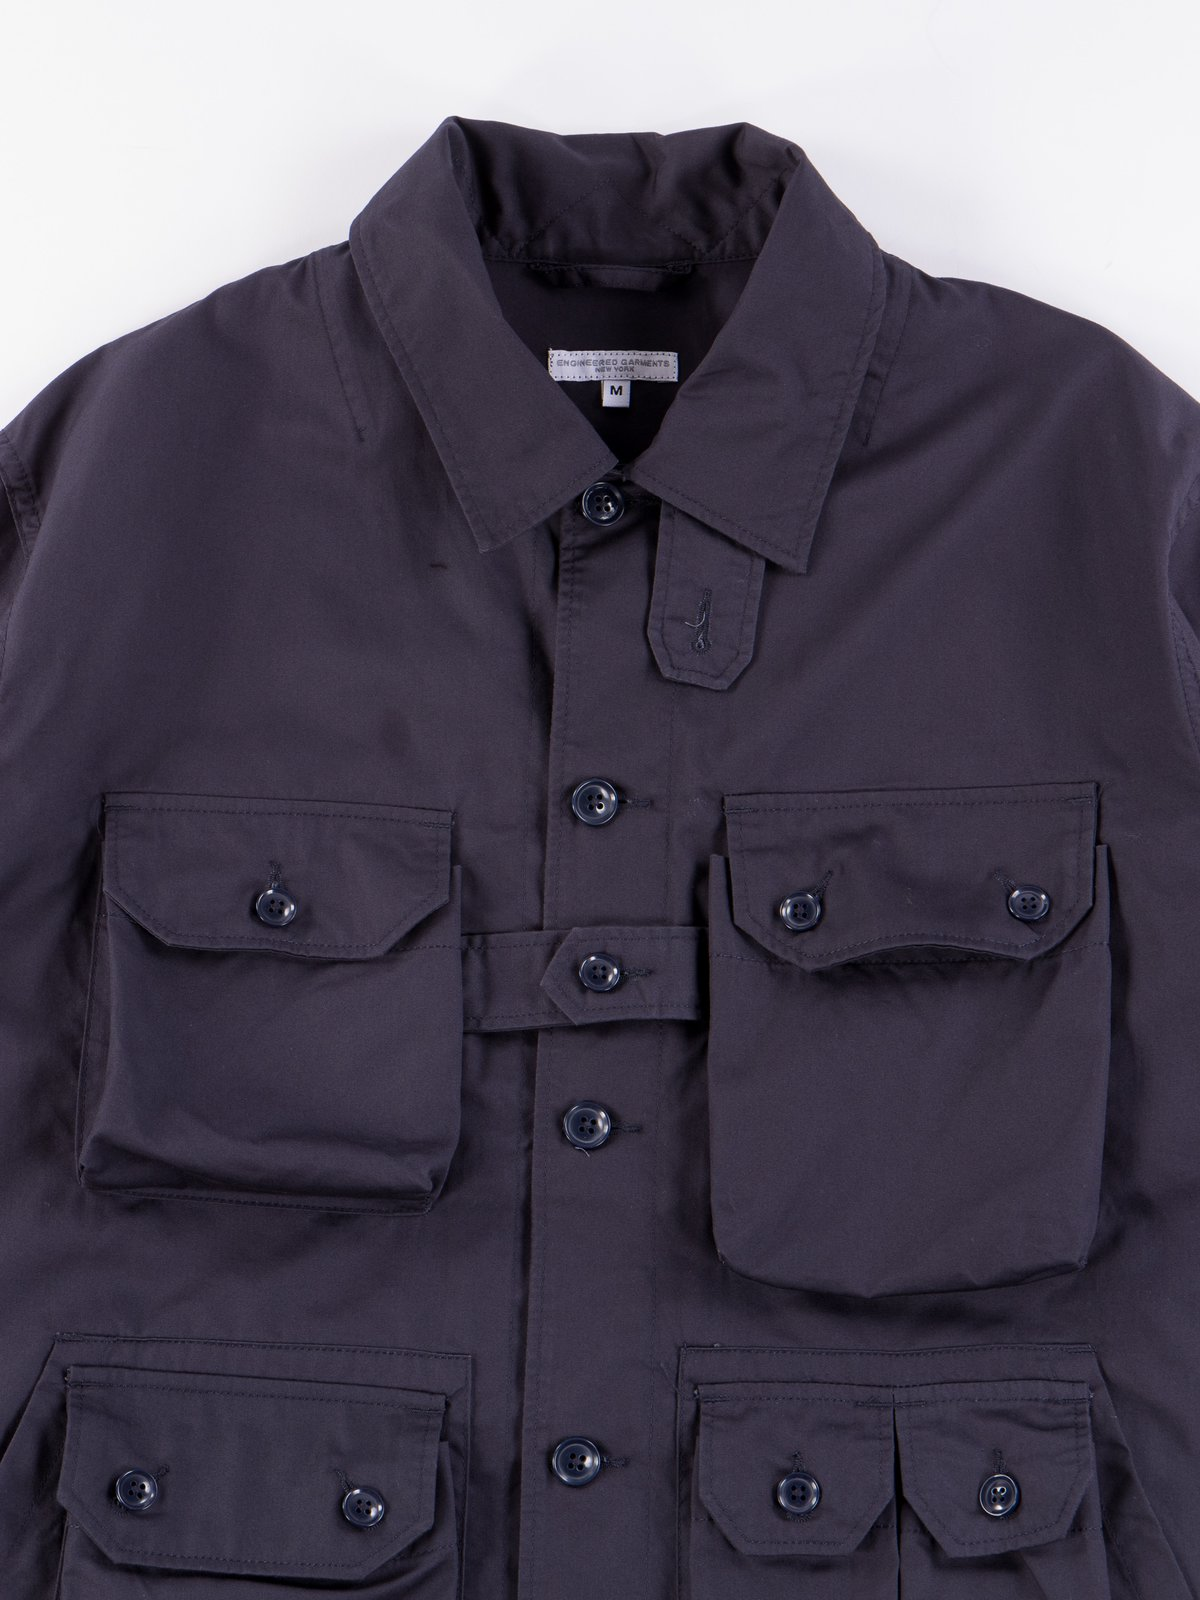 Dark Navy Highcount Twill Explorer Shirt Jacket - Image 4